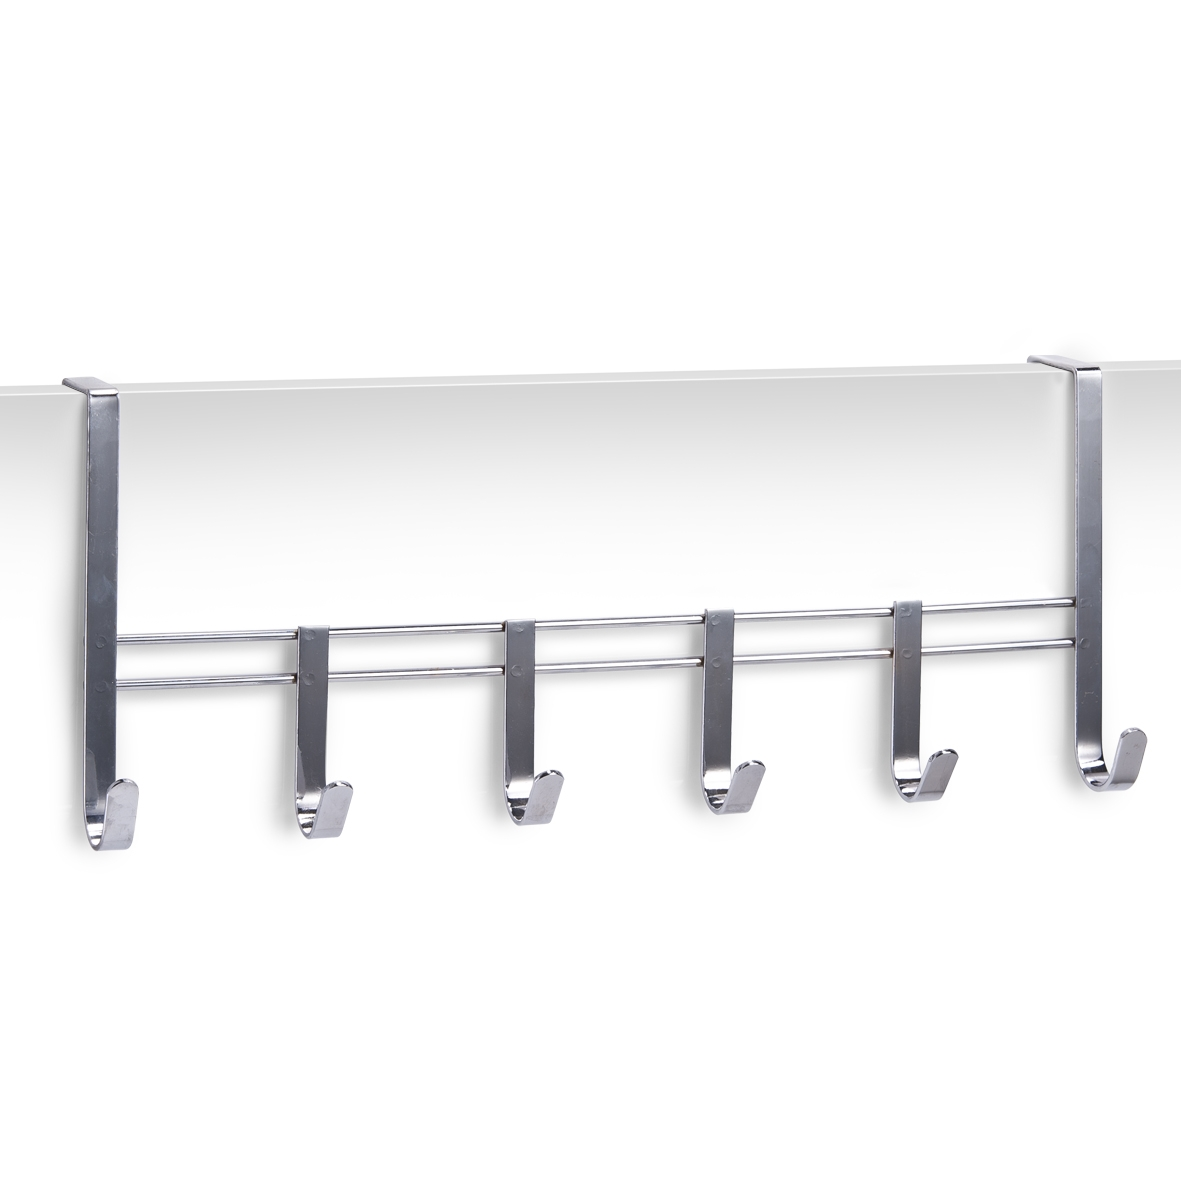 Cuier pentru usa, din metal, Scandi Crom, l51xA8xH20,5 cm somproduct.ro